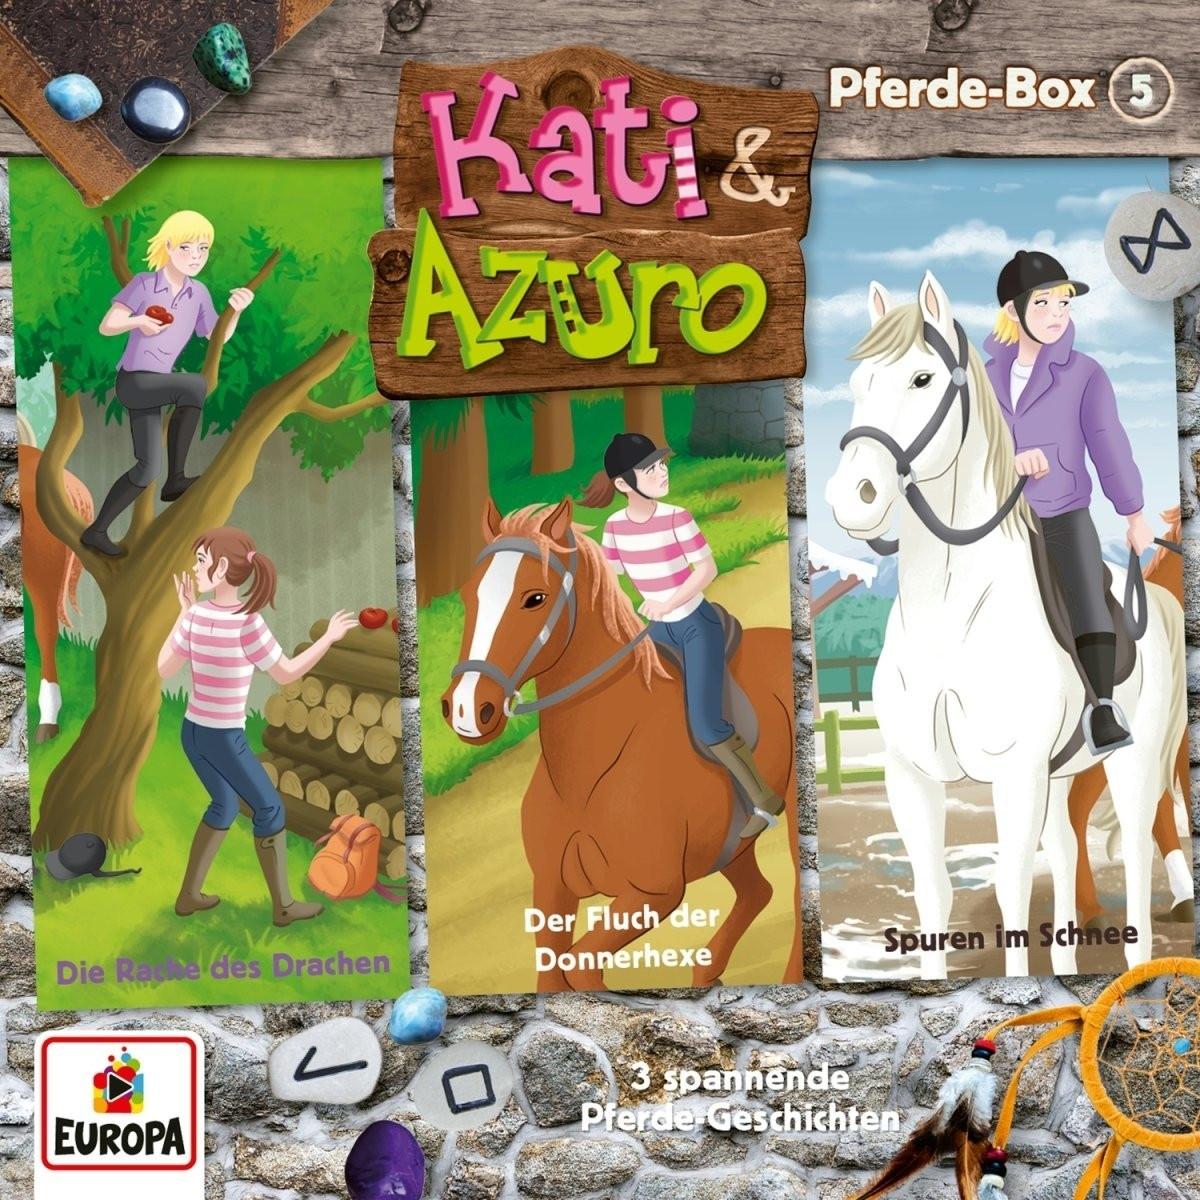 Kati & Azuro - Pferde Box 5 (Folge 13, 14, 15)